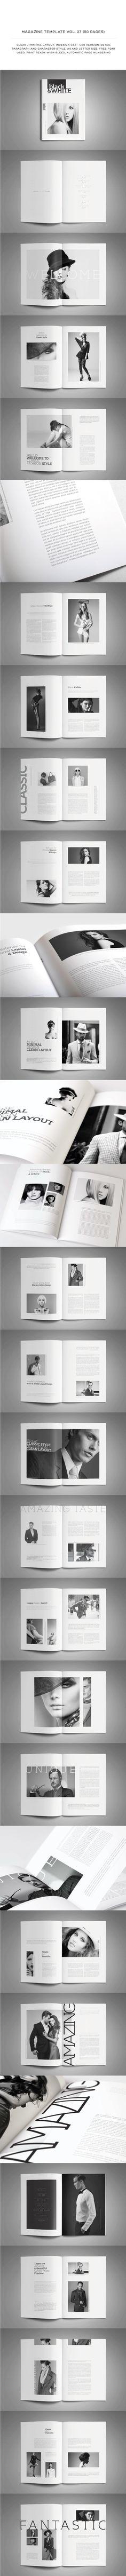 Black & White Magz by Jumadi M. Nur, via Behance